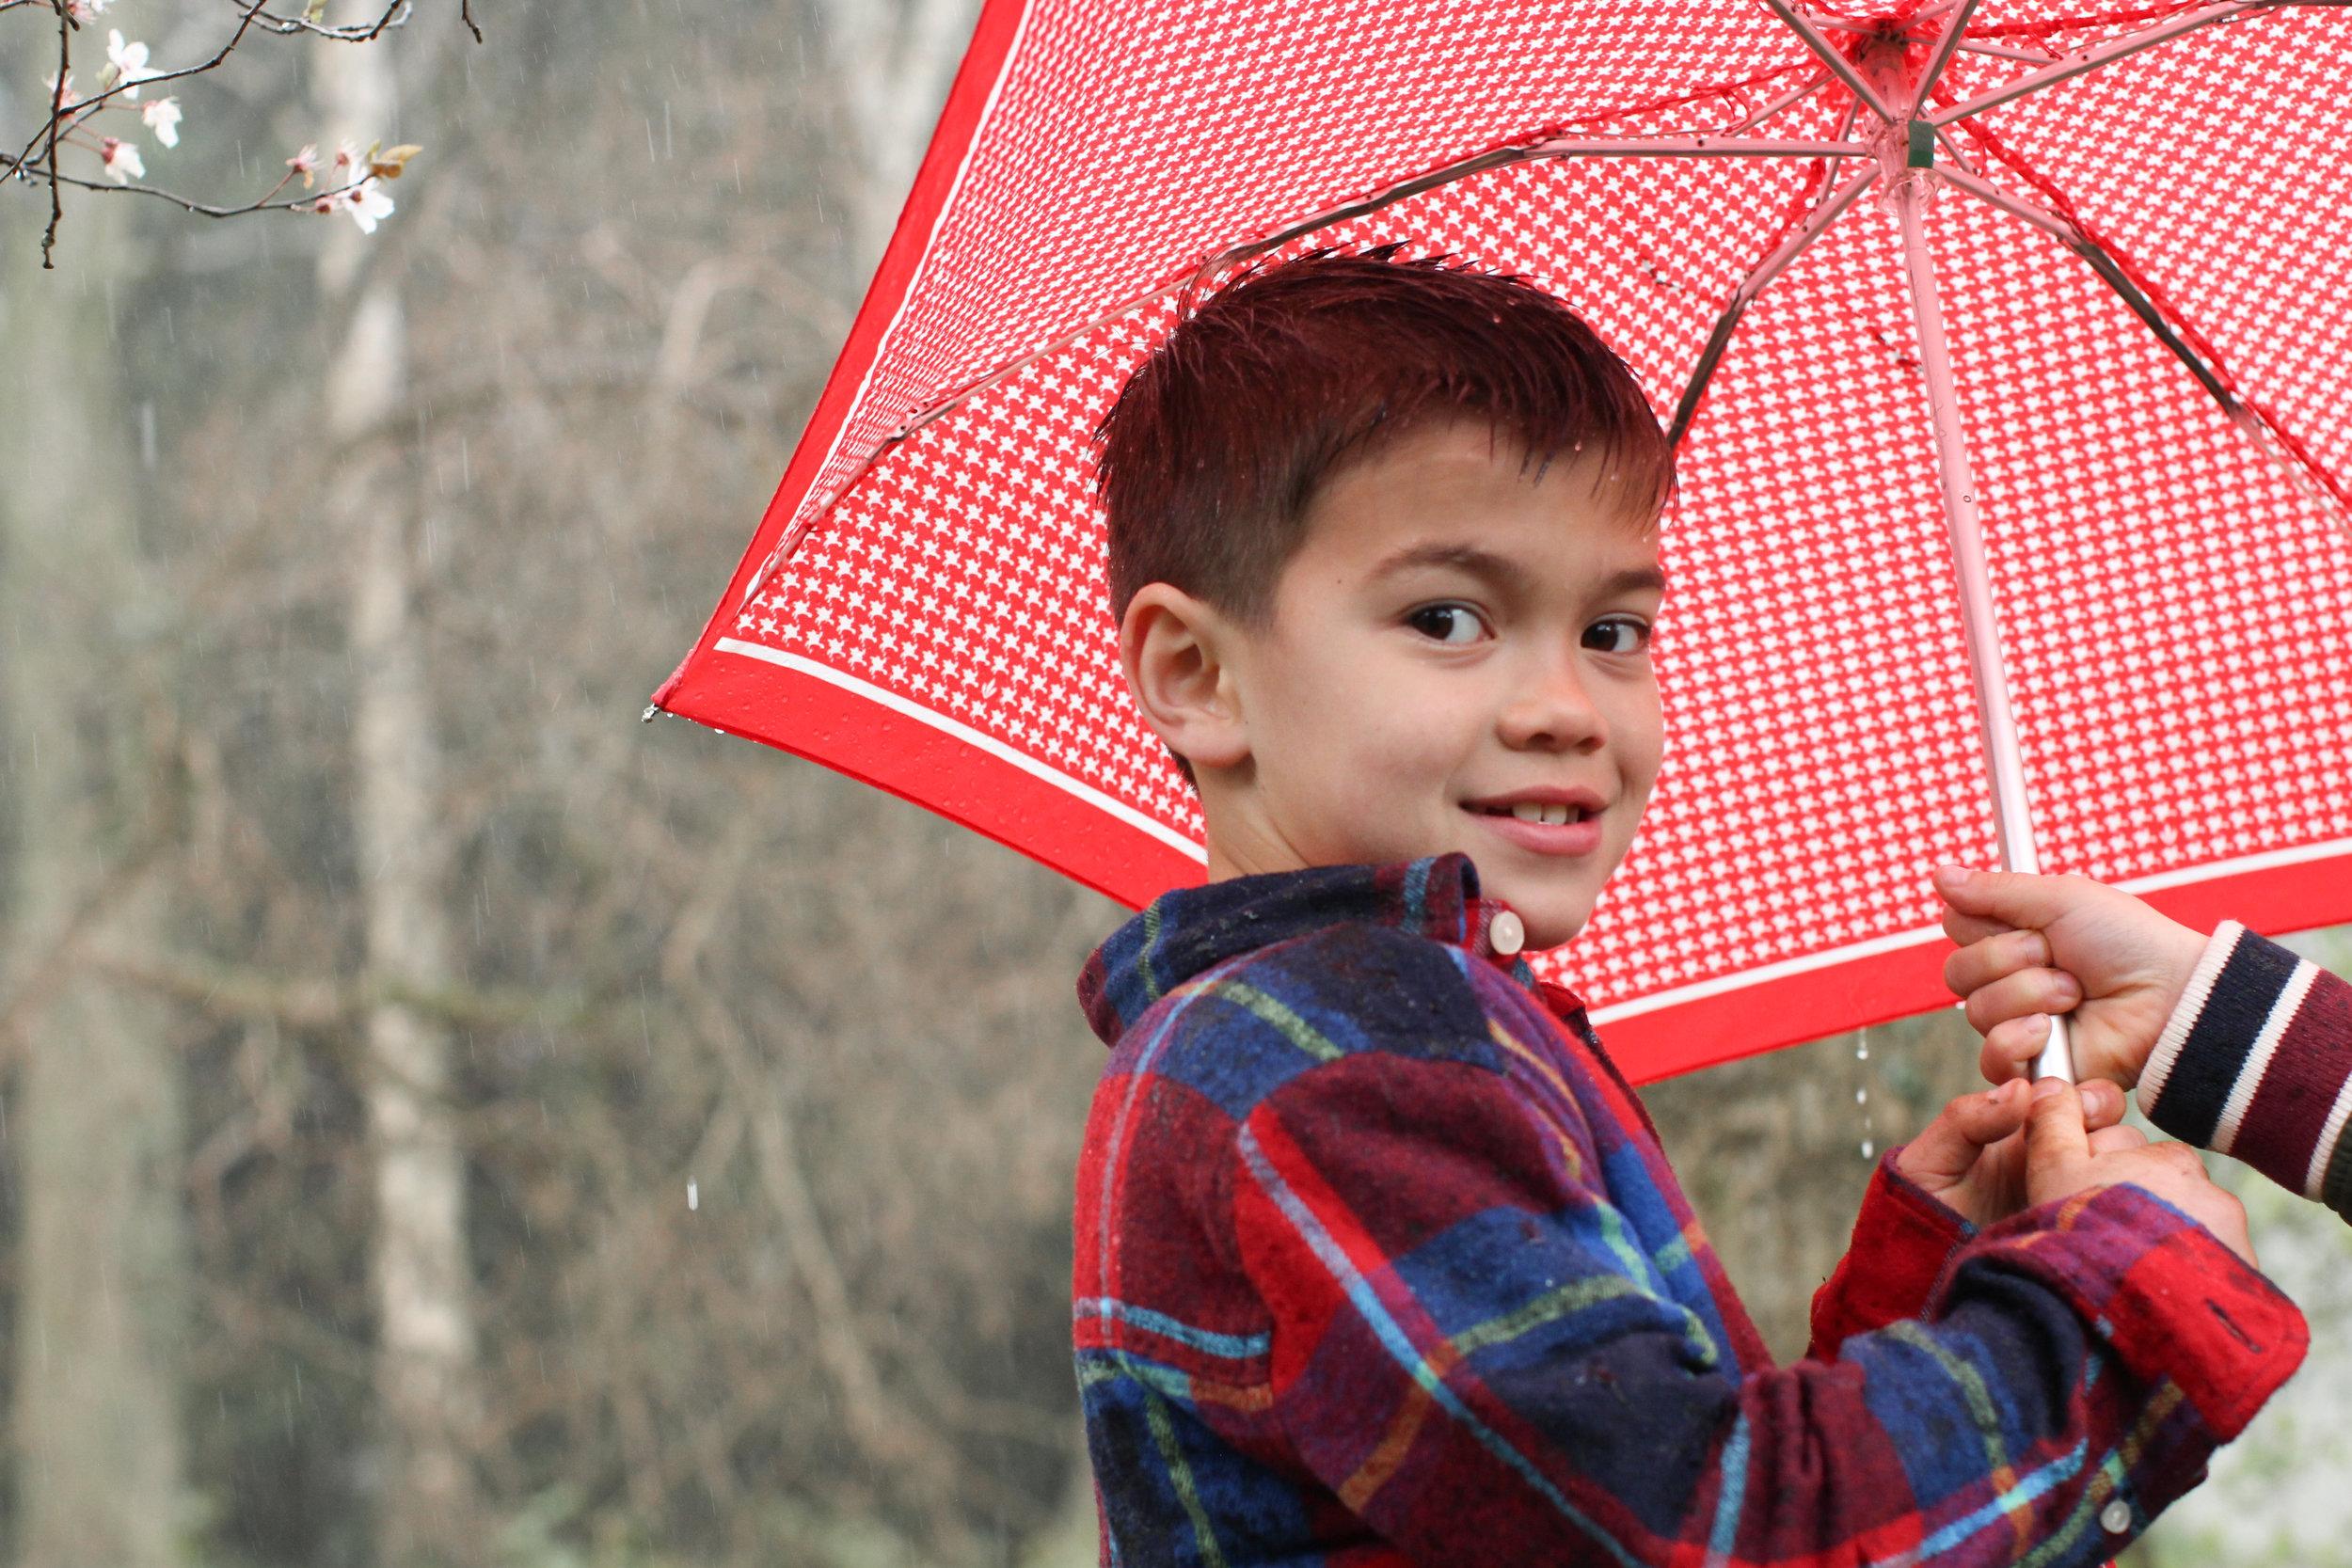 Raining at Thorp Perrow